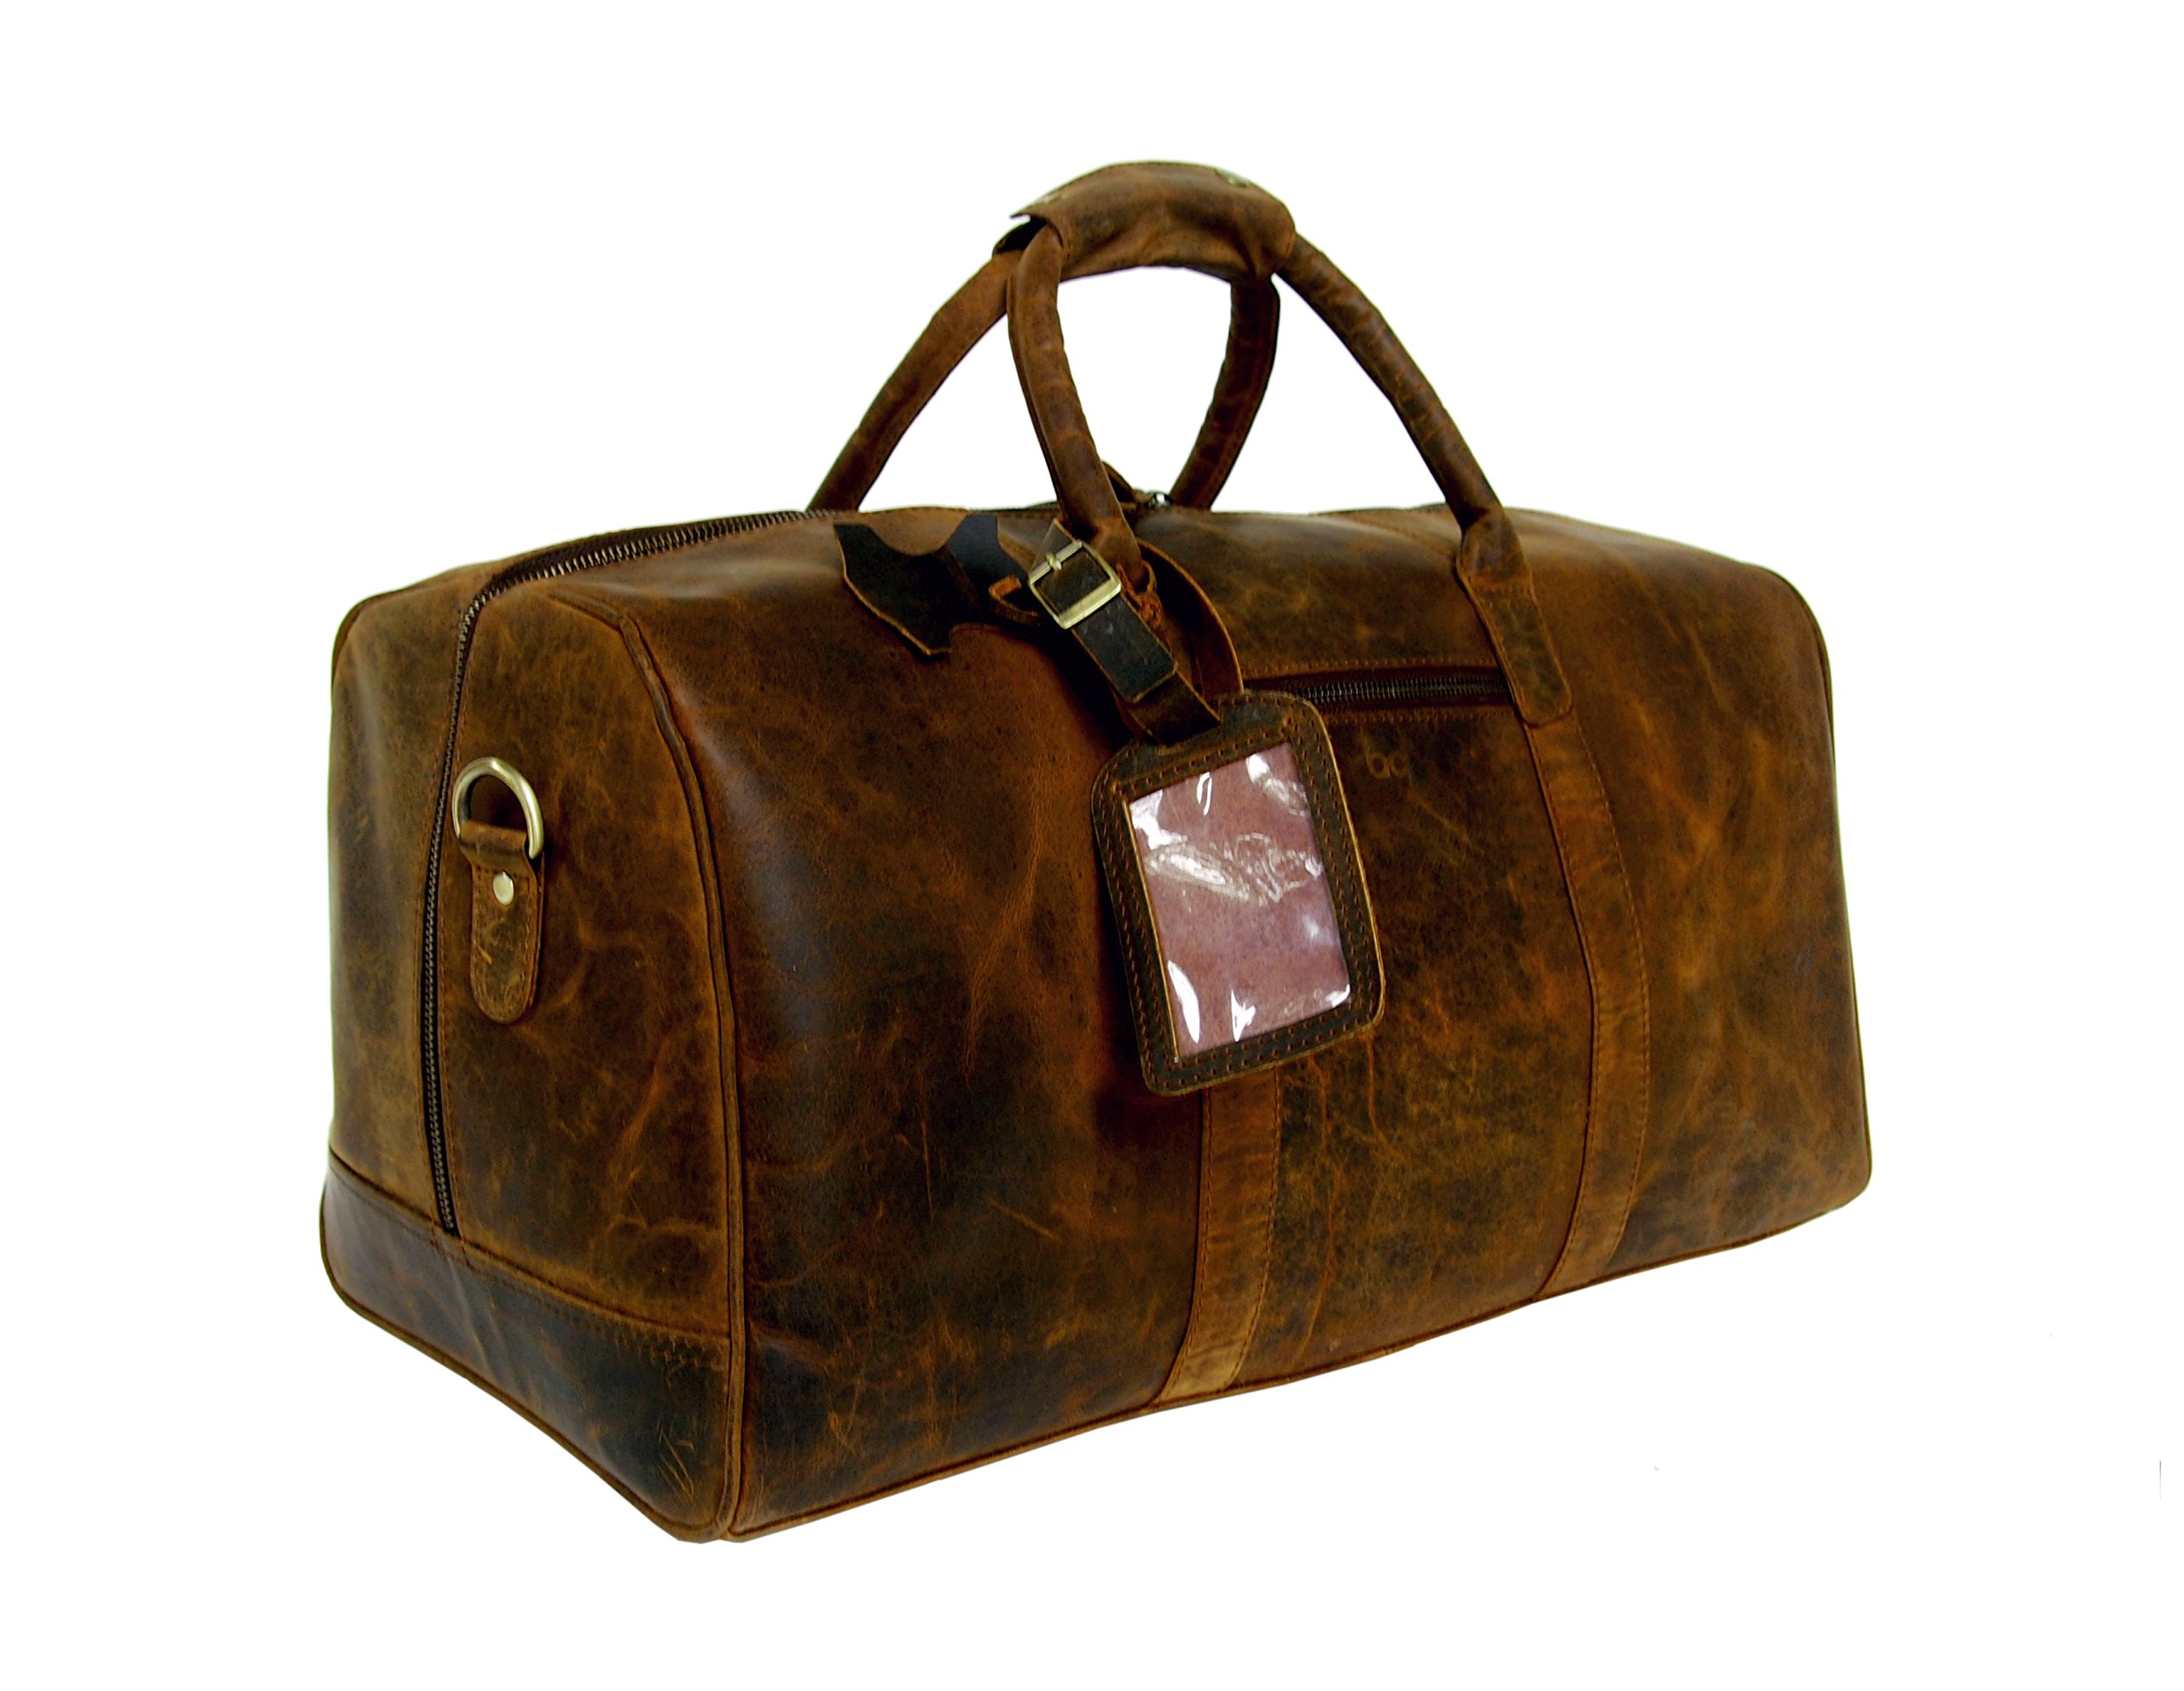 Basic Gear Full Grain Leather Weekender Travel Bag